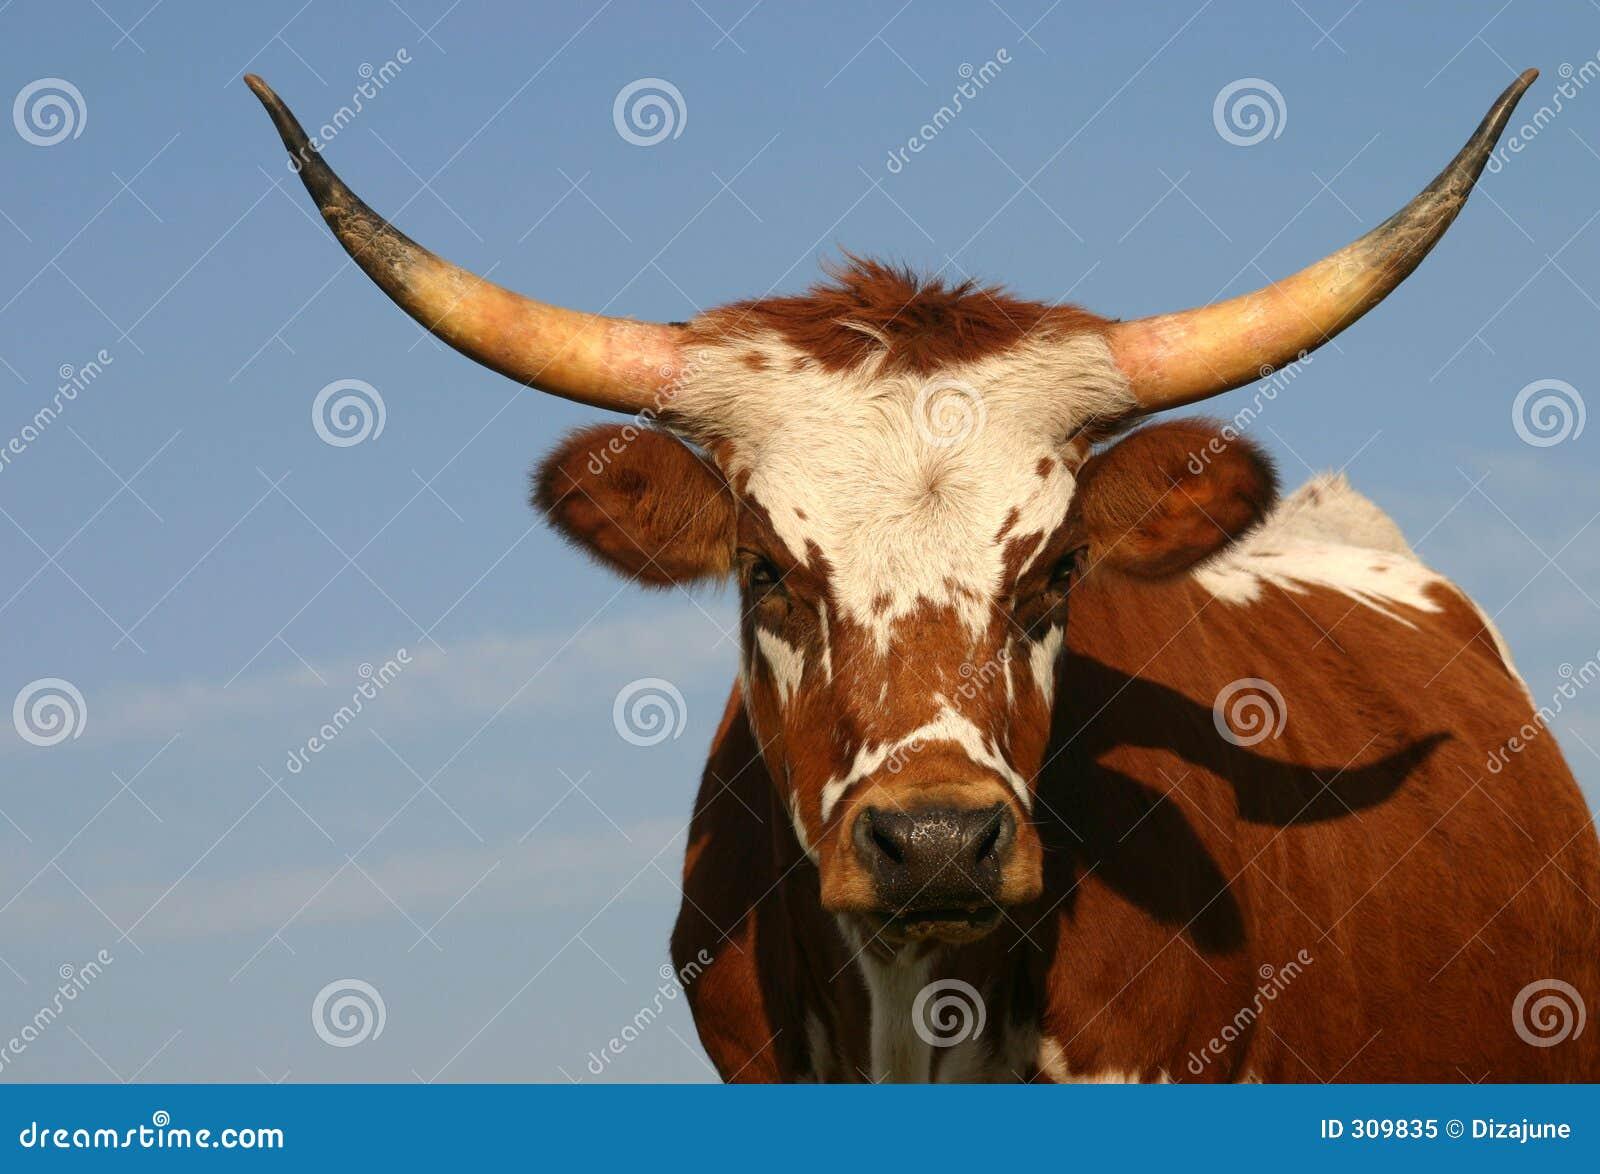 Big Longhorn Logo Longhorn Cow